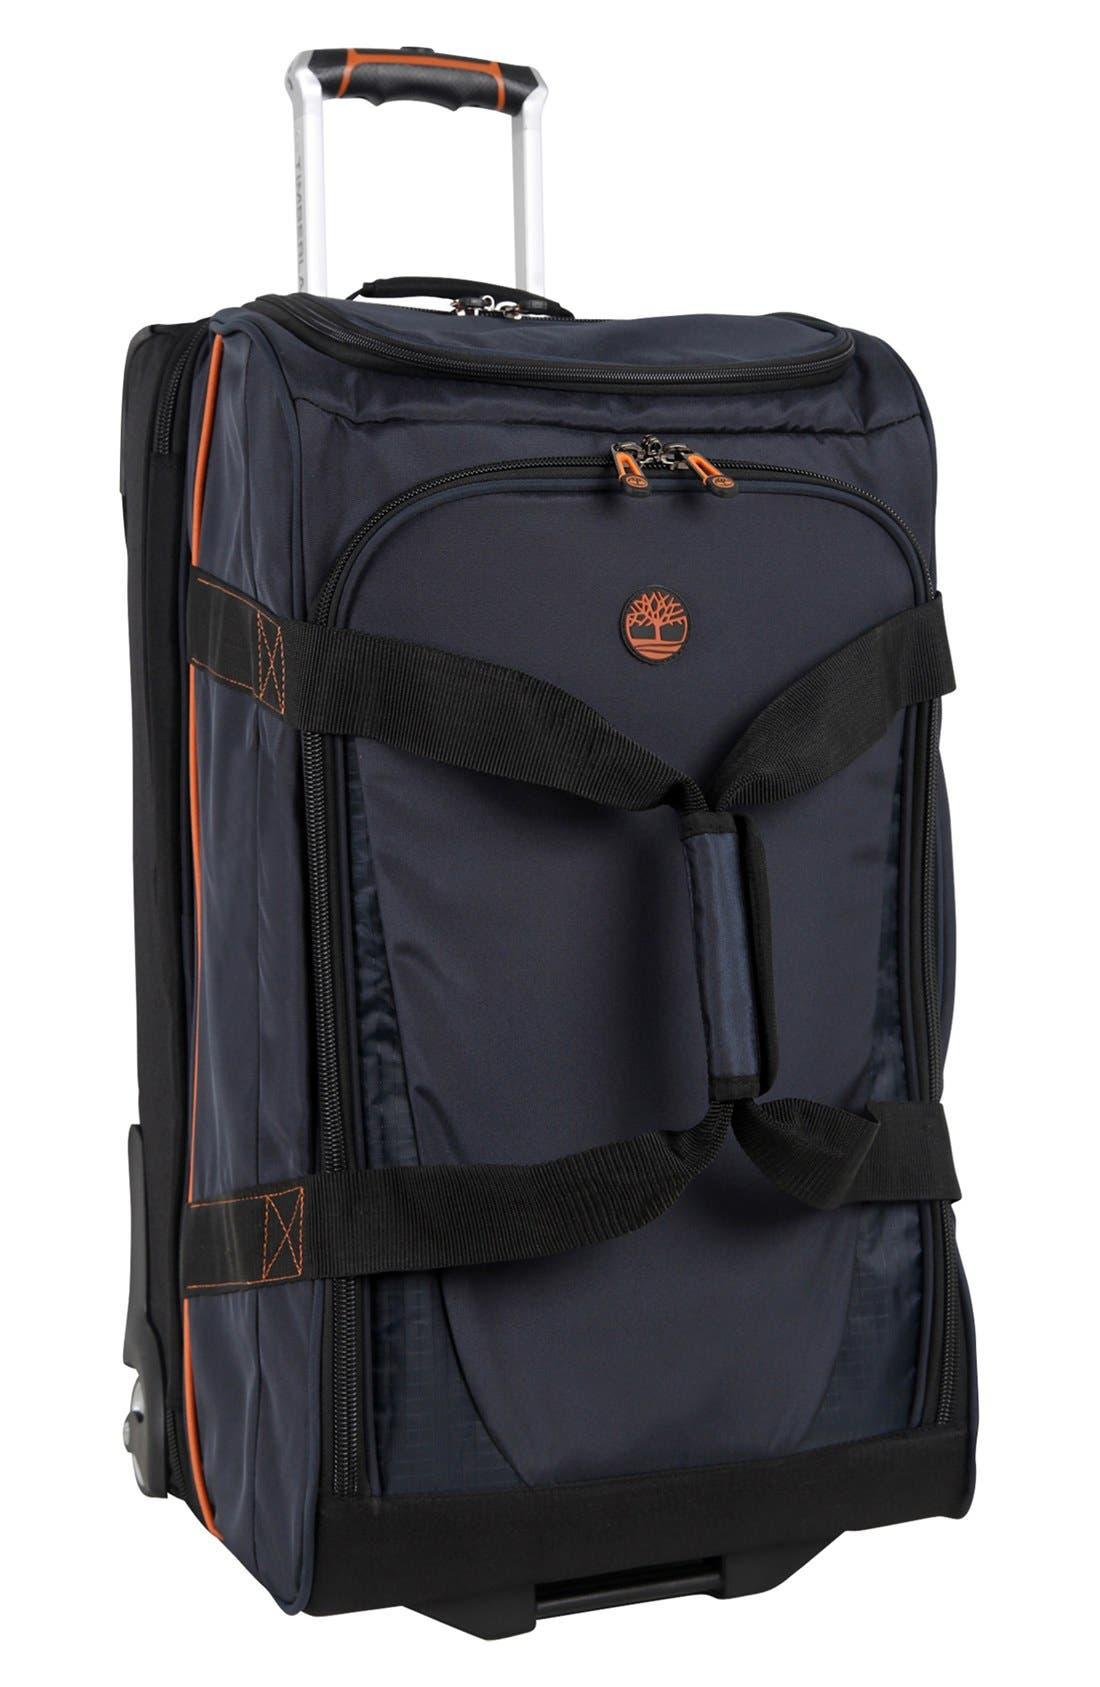 Alternate Image 1 Selected - Timberland 'Mascoma' Rolling Duffel Bag (26 Inch)